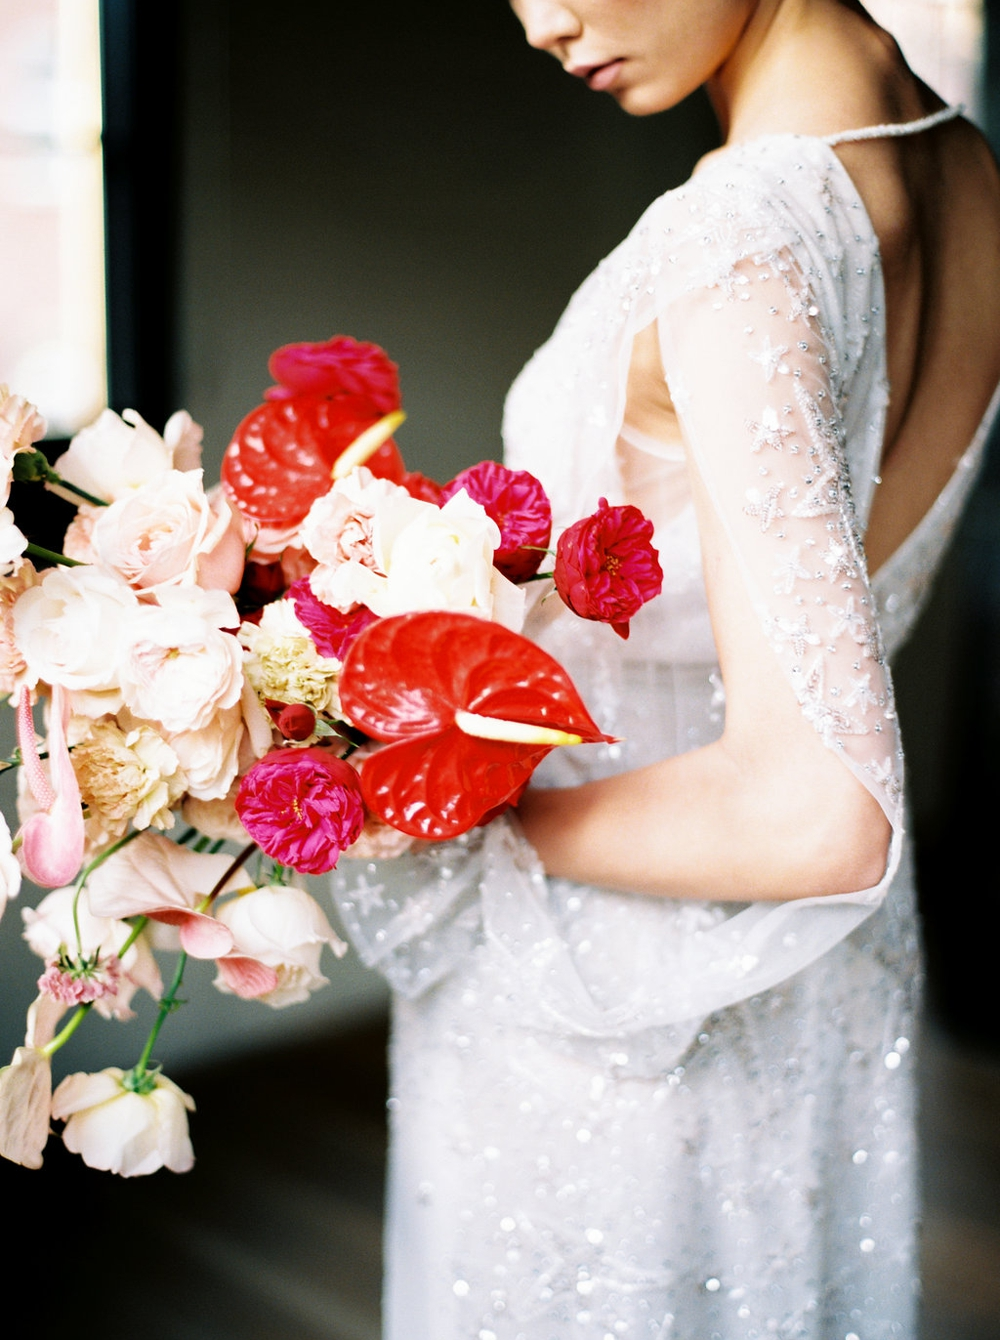 editorial-session-seattle-flower-stylist 21.jpg